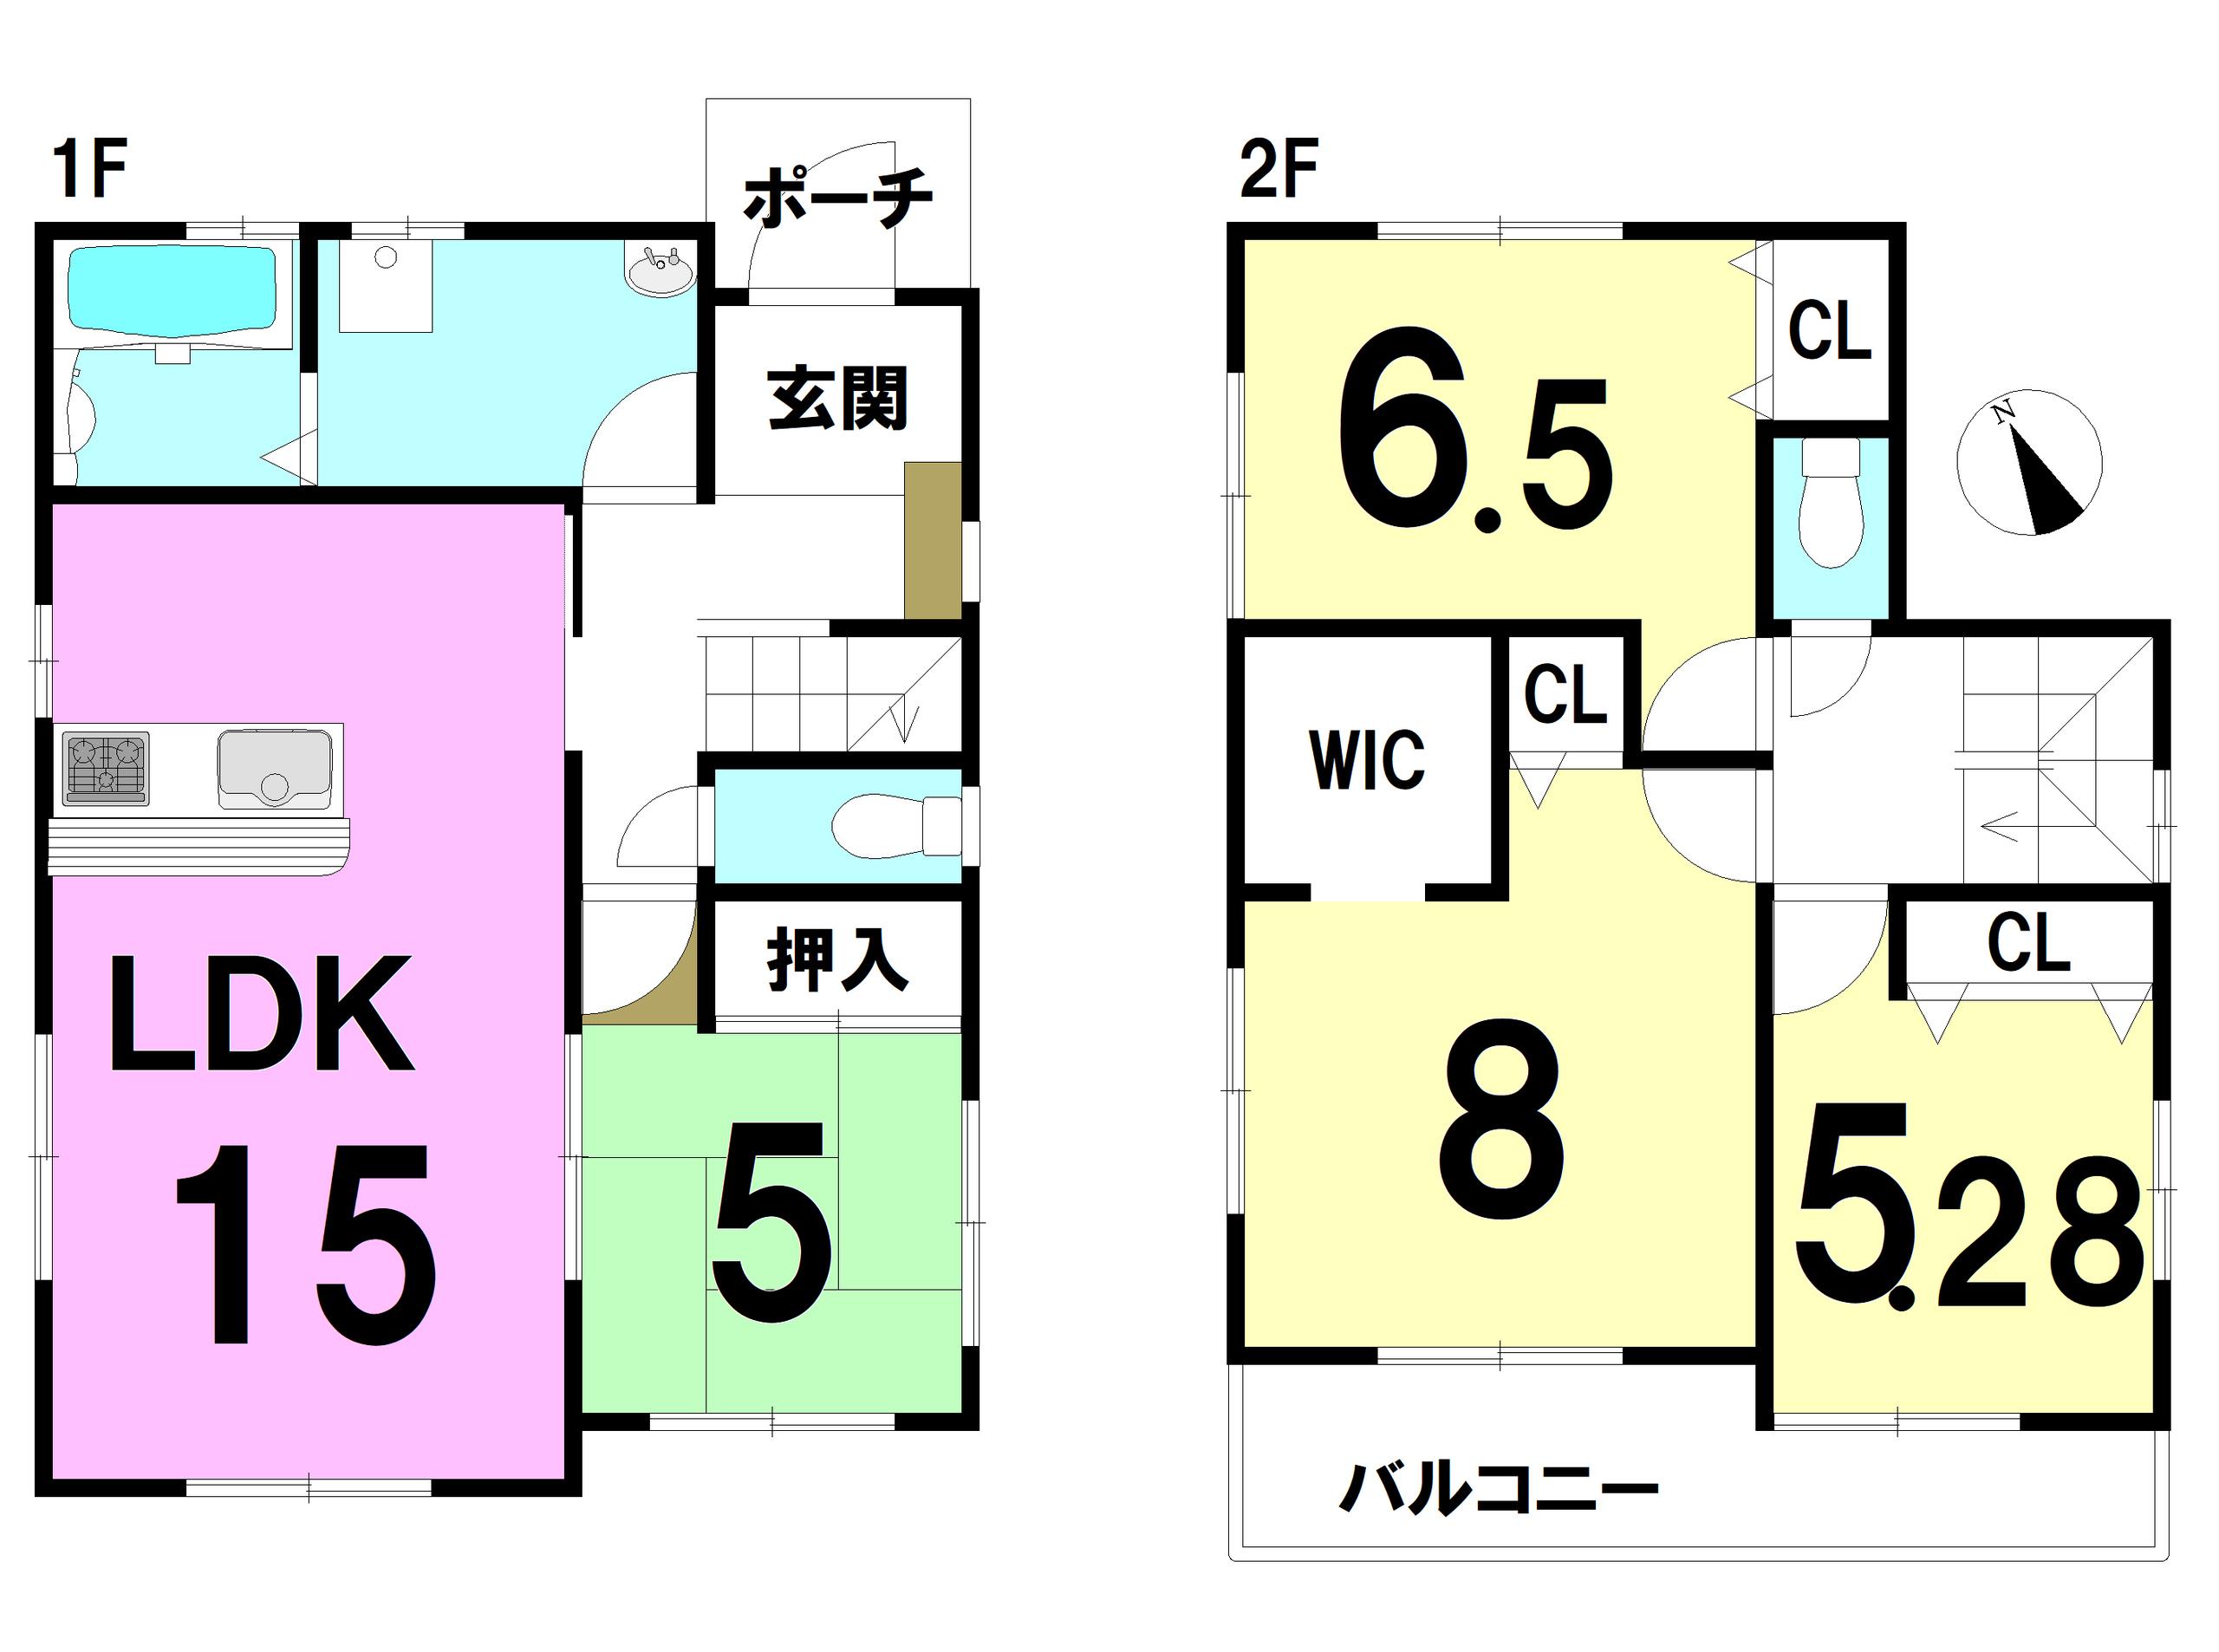 【間取り】 4LDK 1F:15LDK 5和 2F:8洋 6.5洋 5.28洋 WIC